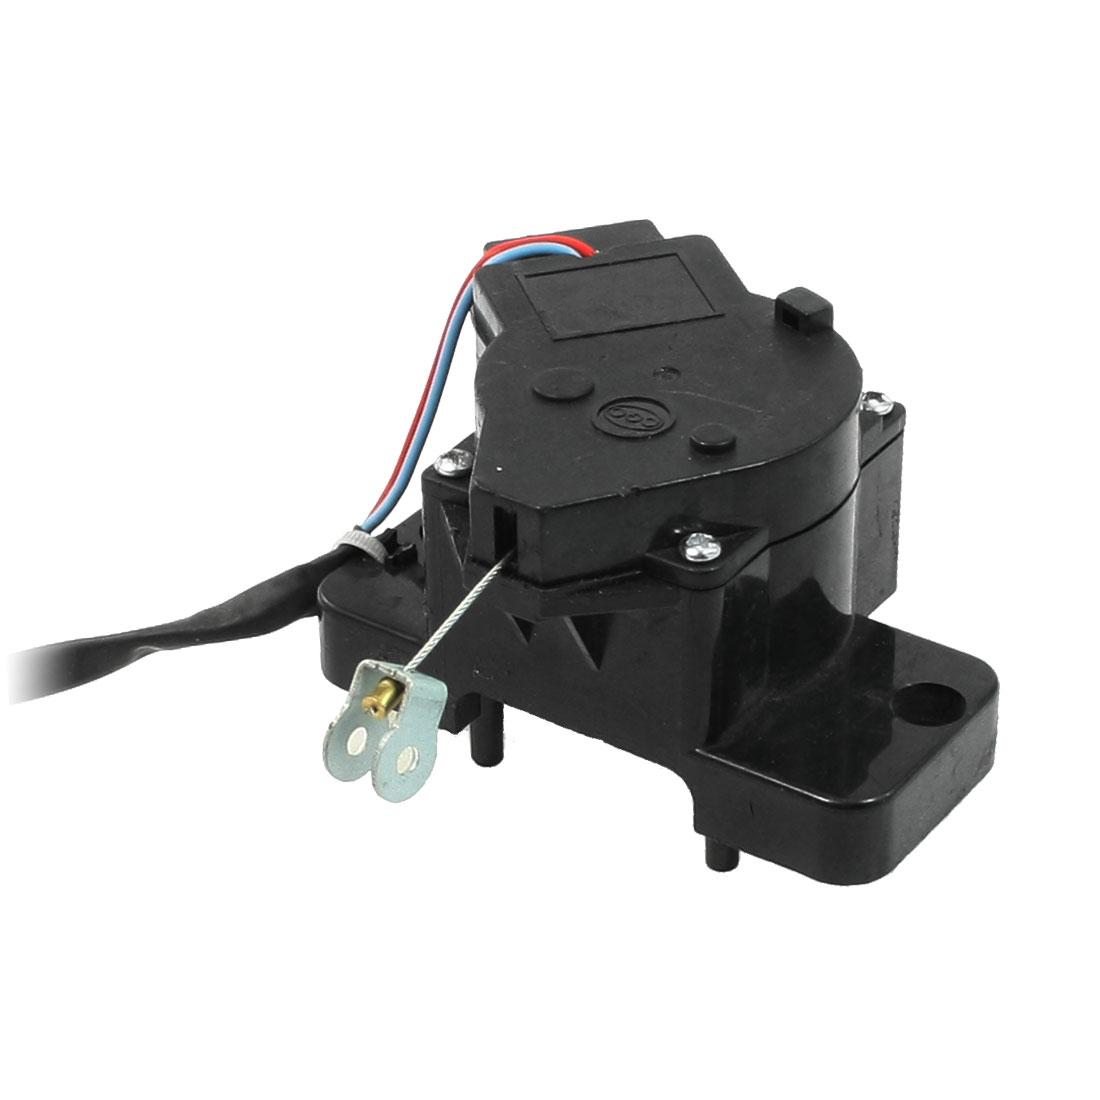 Plastic Housing Drain Valve Motor Tractor for Laishida Washer AC220-240V 50/60Hz